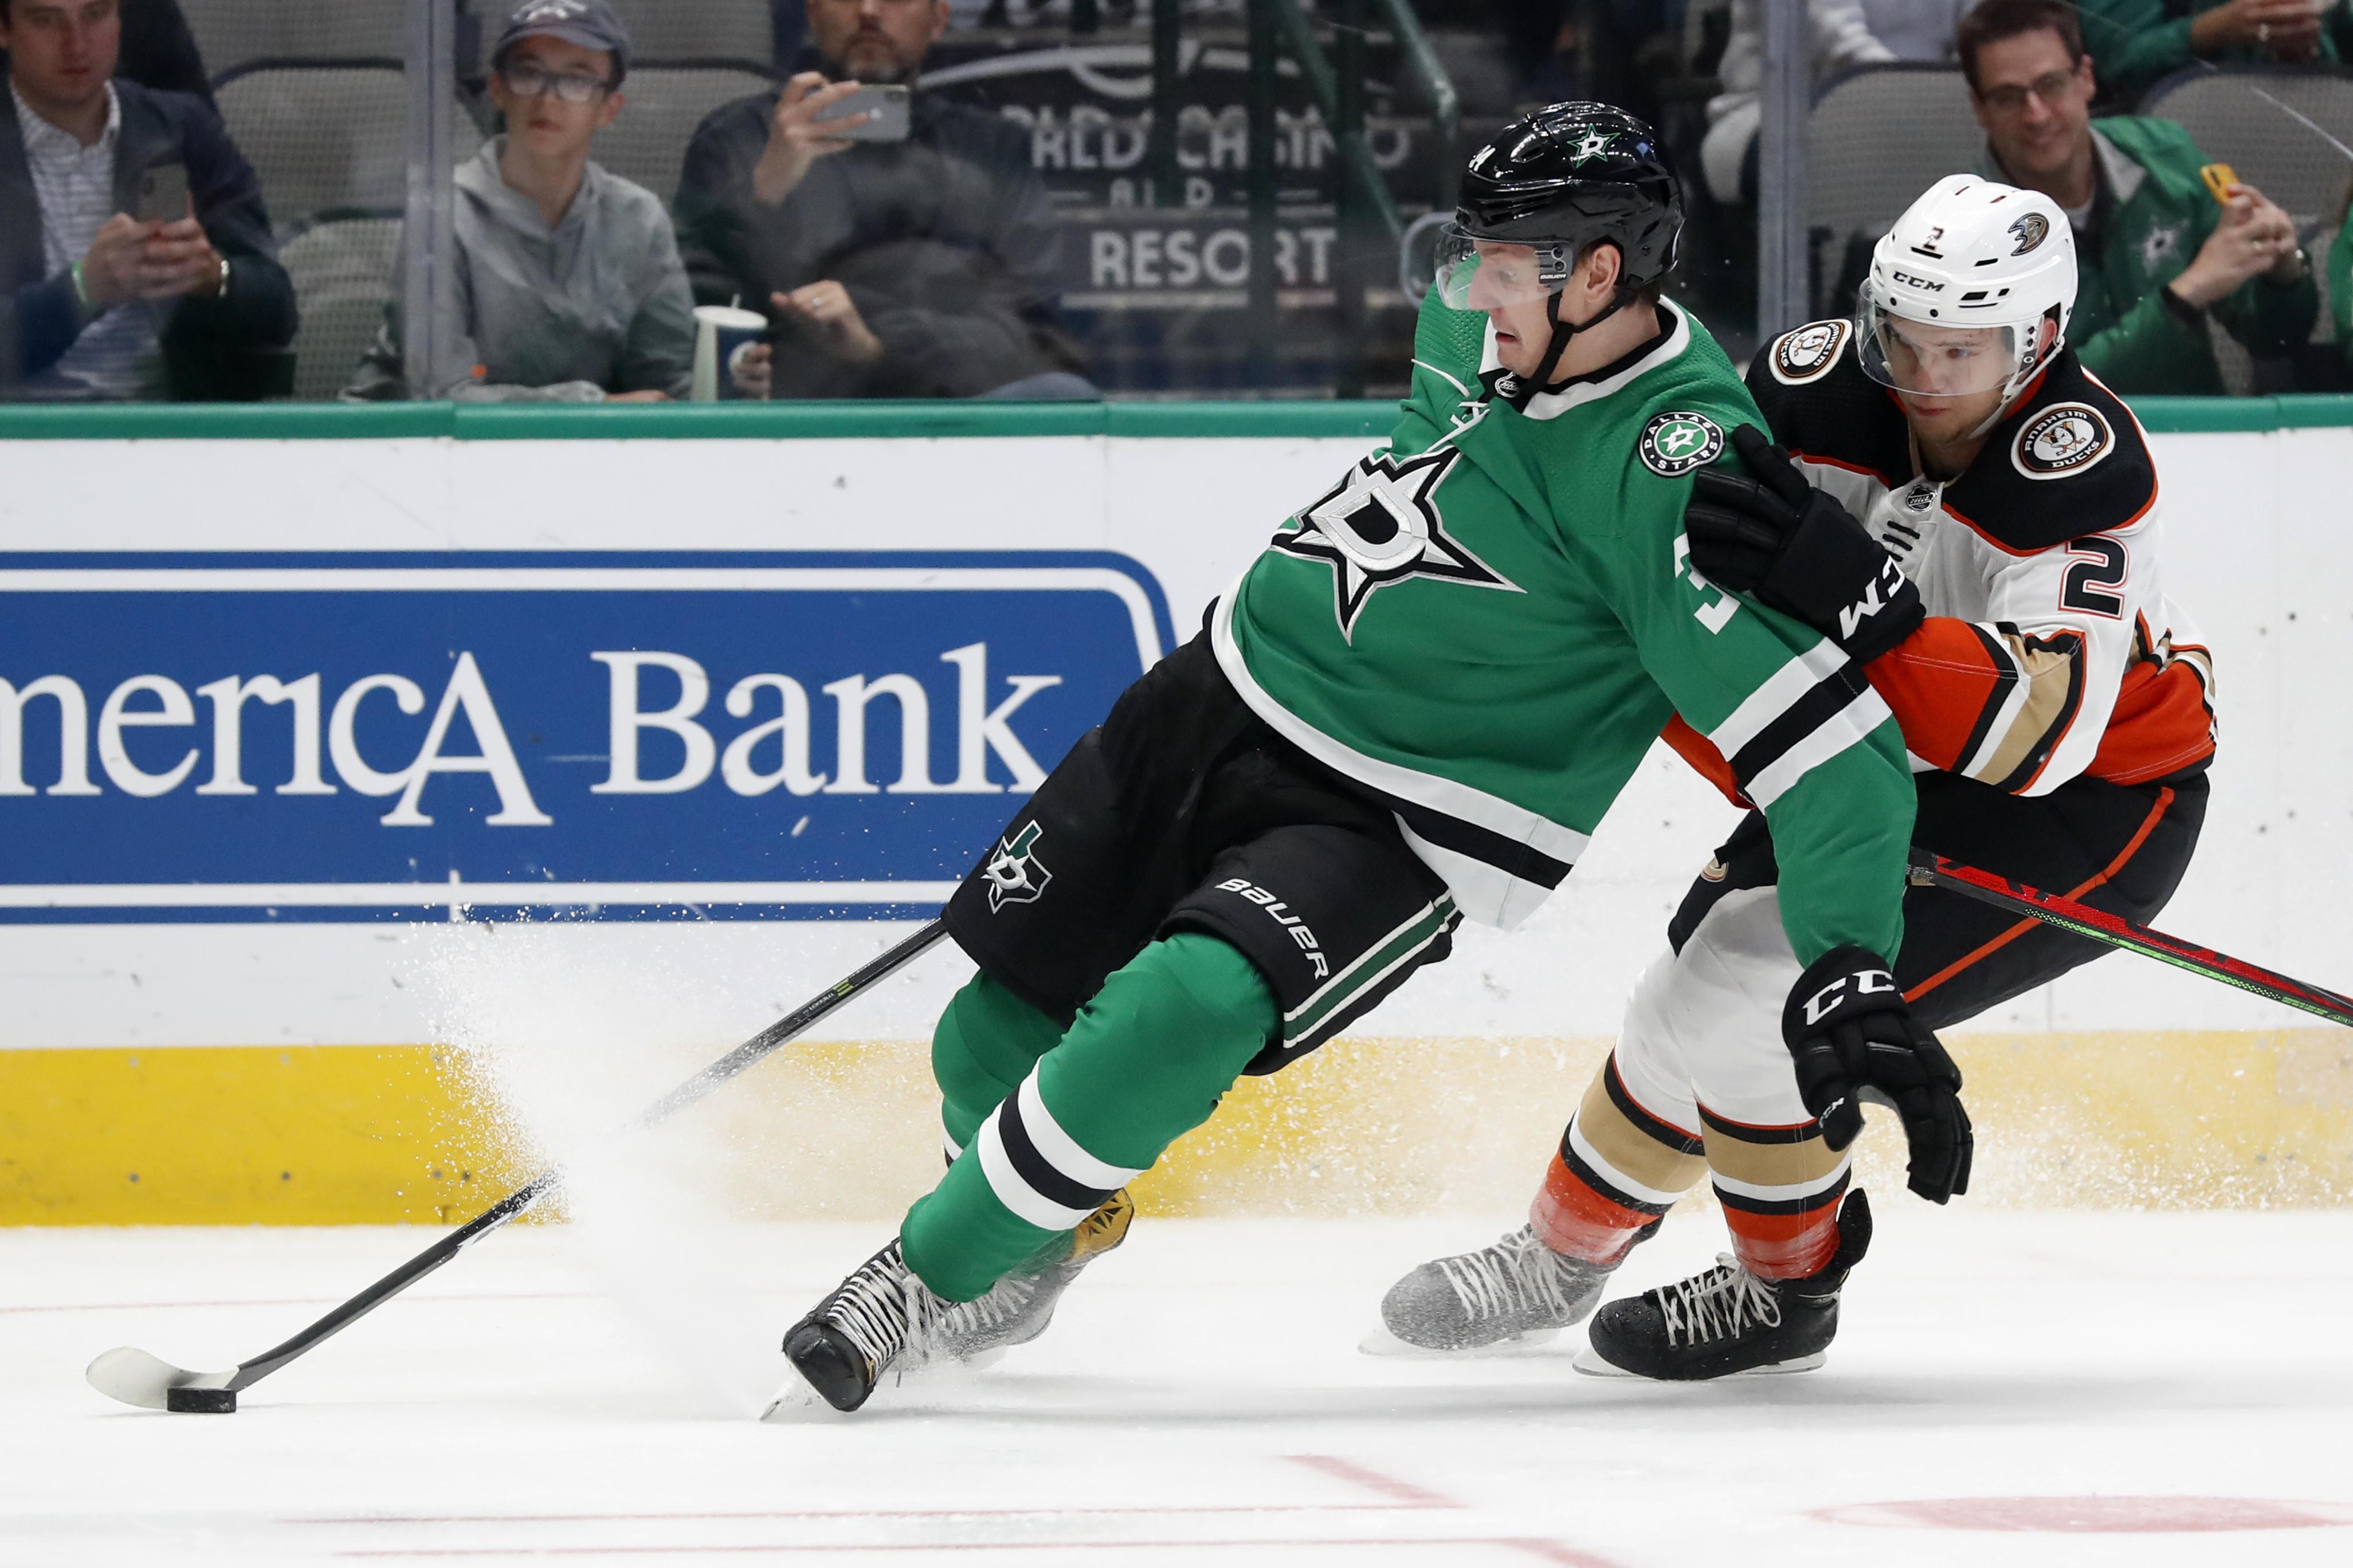 Gurianov scores both goals, Stars hold off Ducks 2-1